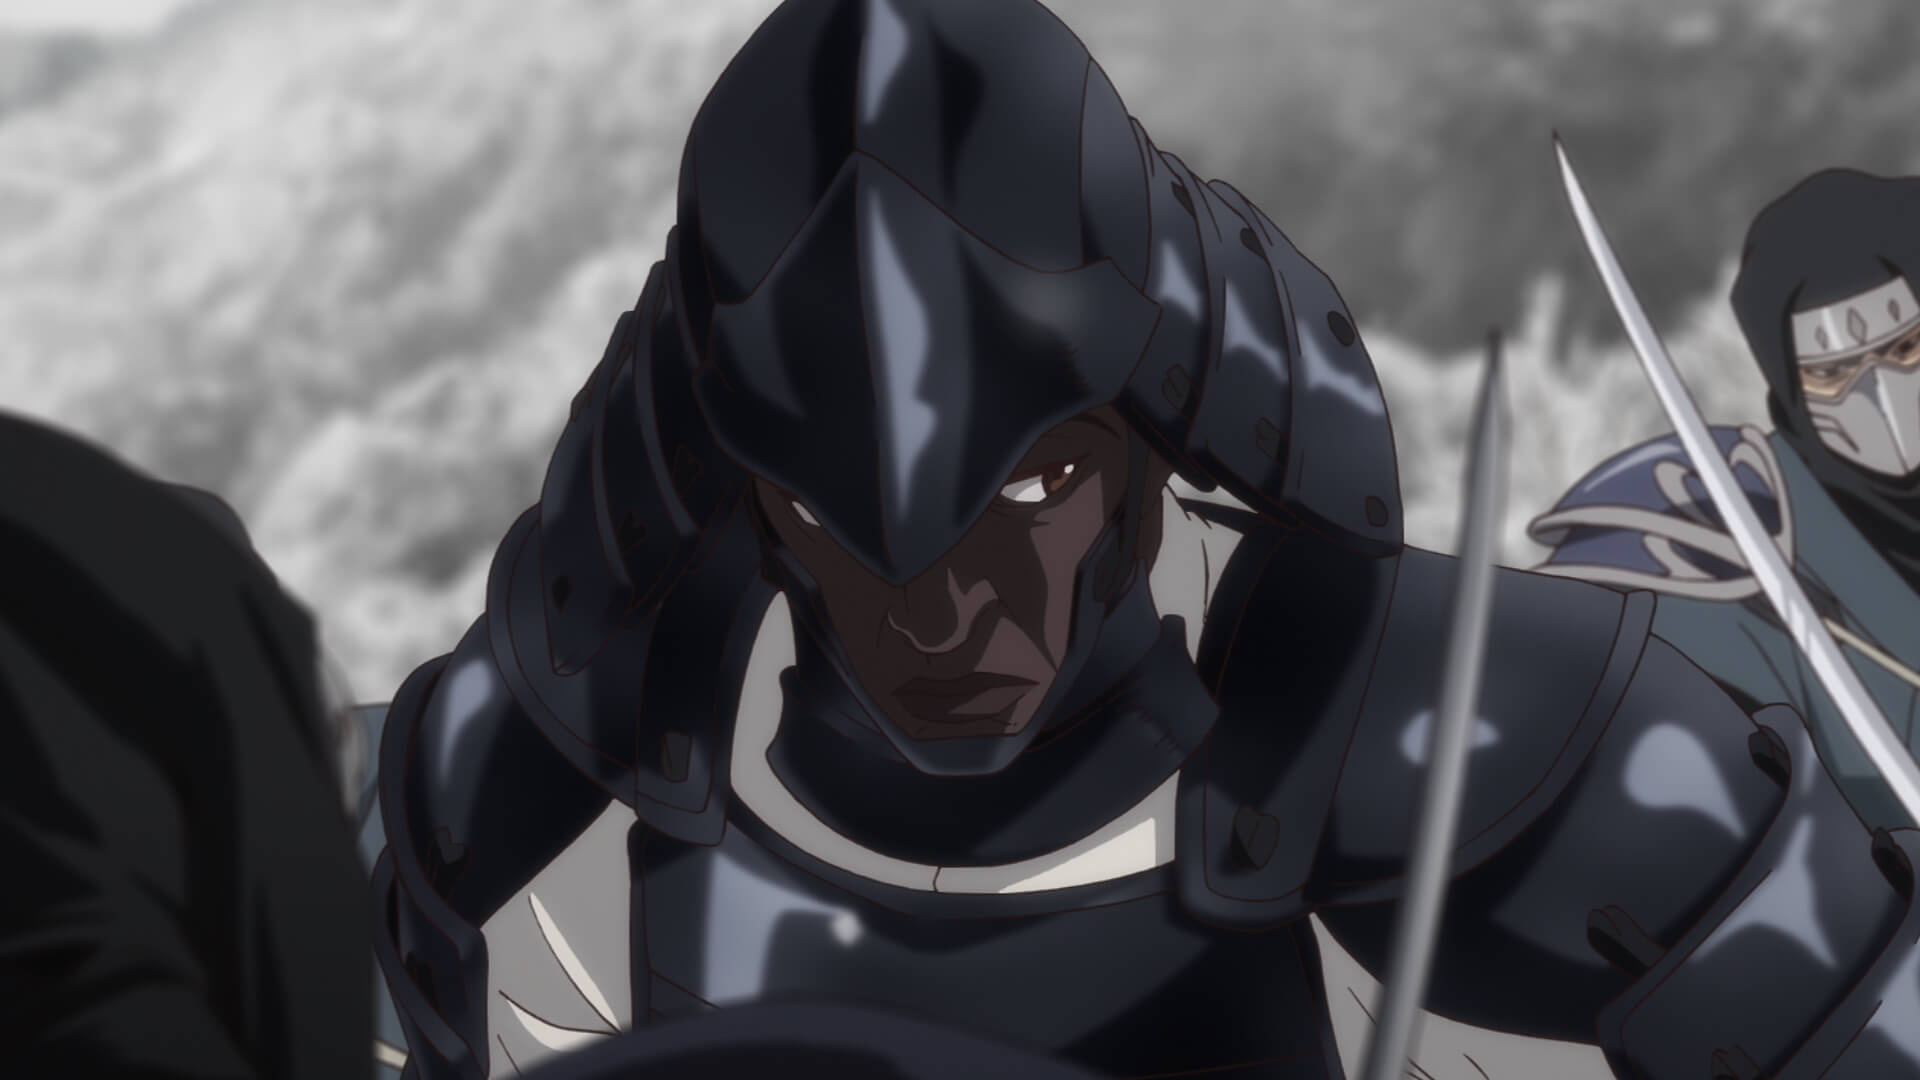 『SHAMAN KING』、『極主夫道』、『転スラ日記』など話題作目白押し!Netflix4月配信のアニメラインナップが解禁 art210326_netflix_anime_12